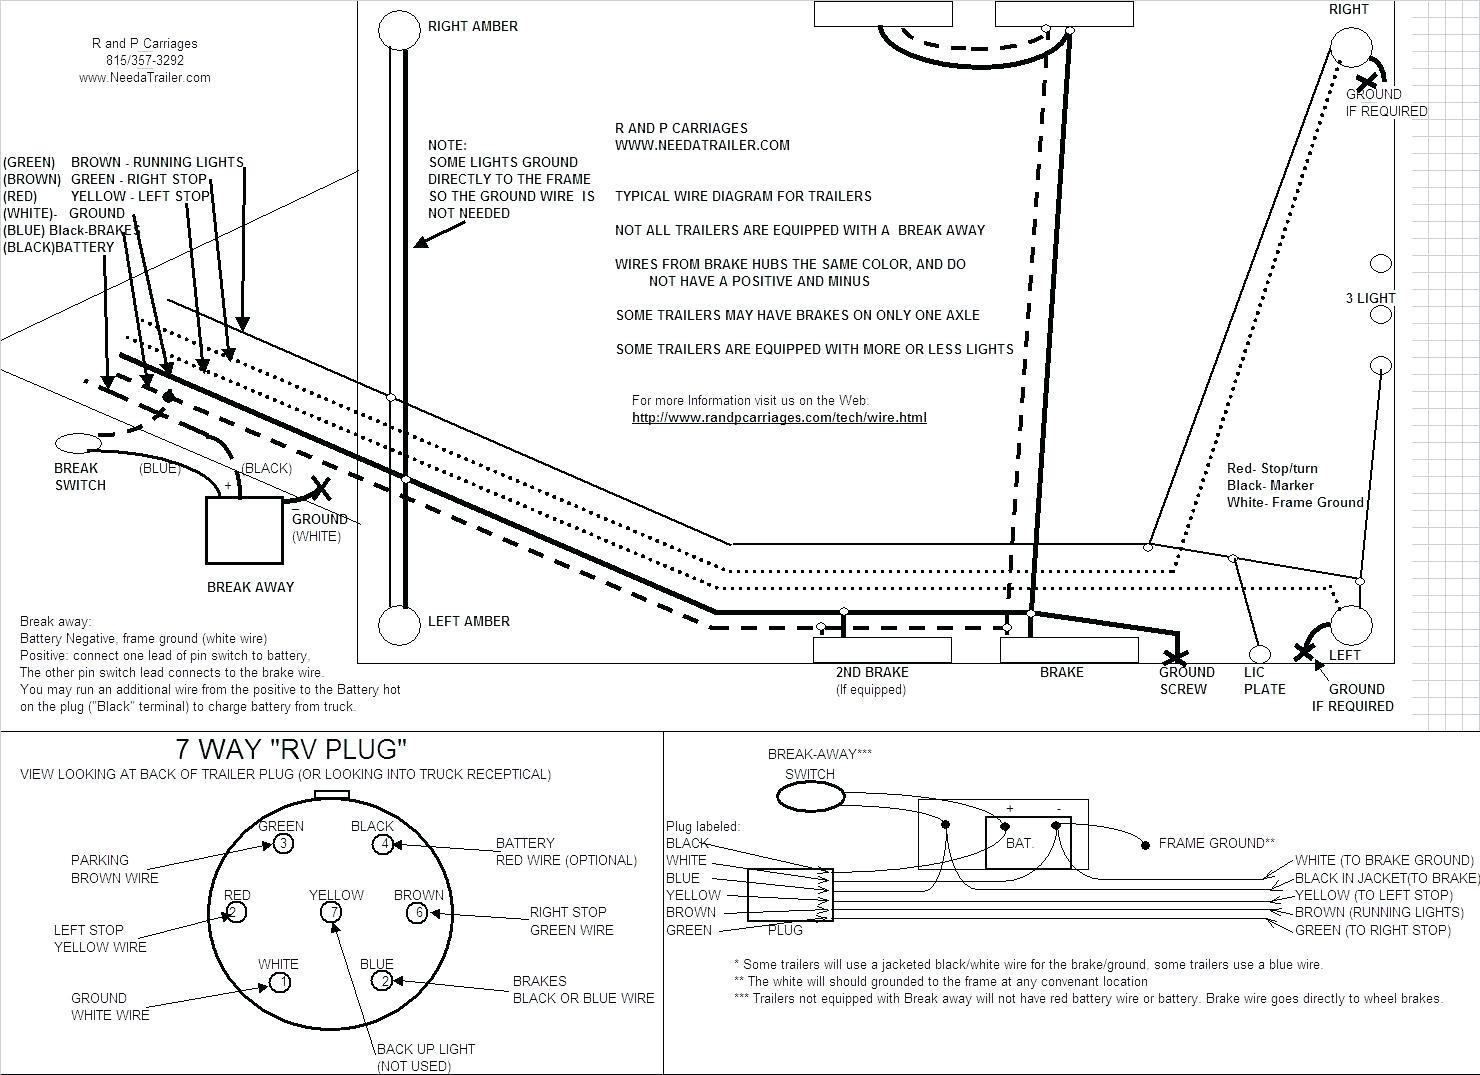 Trailer Lights Wiring Diagram 4 Wire : Trailer light wiring diagram way new image